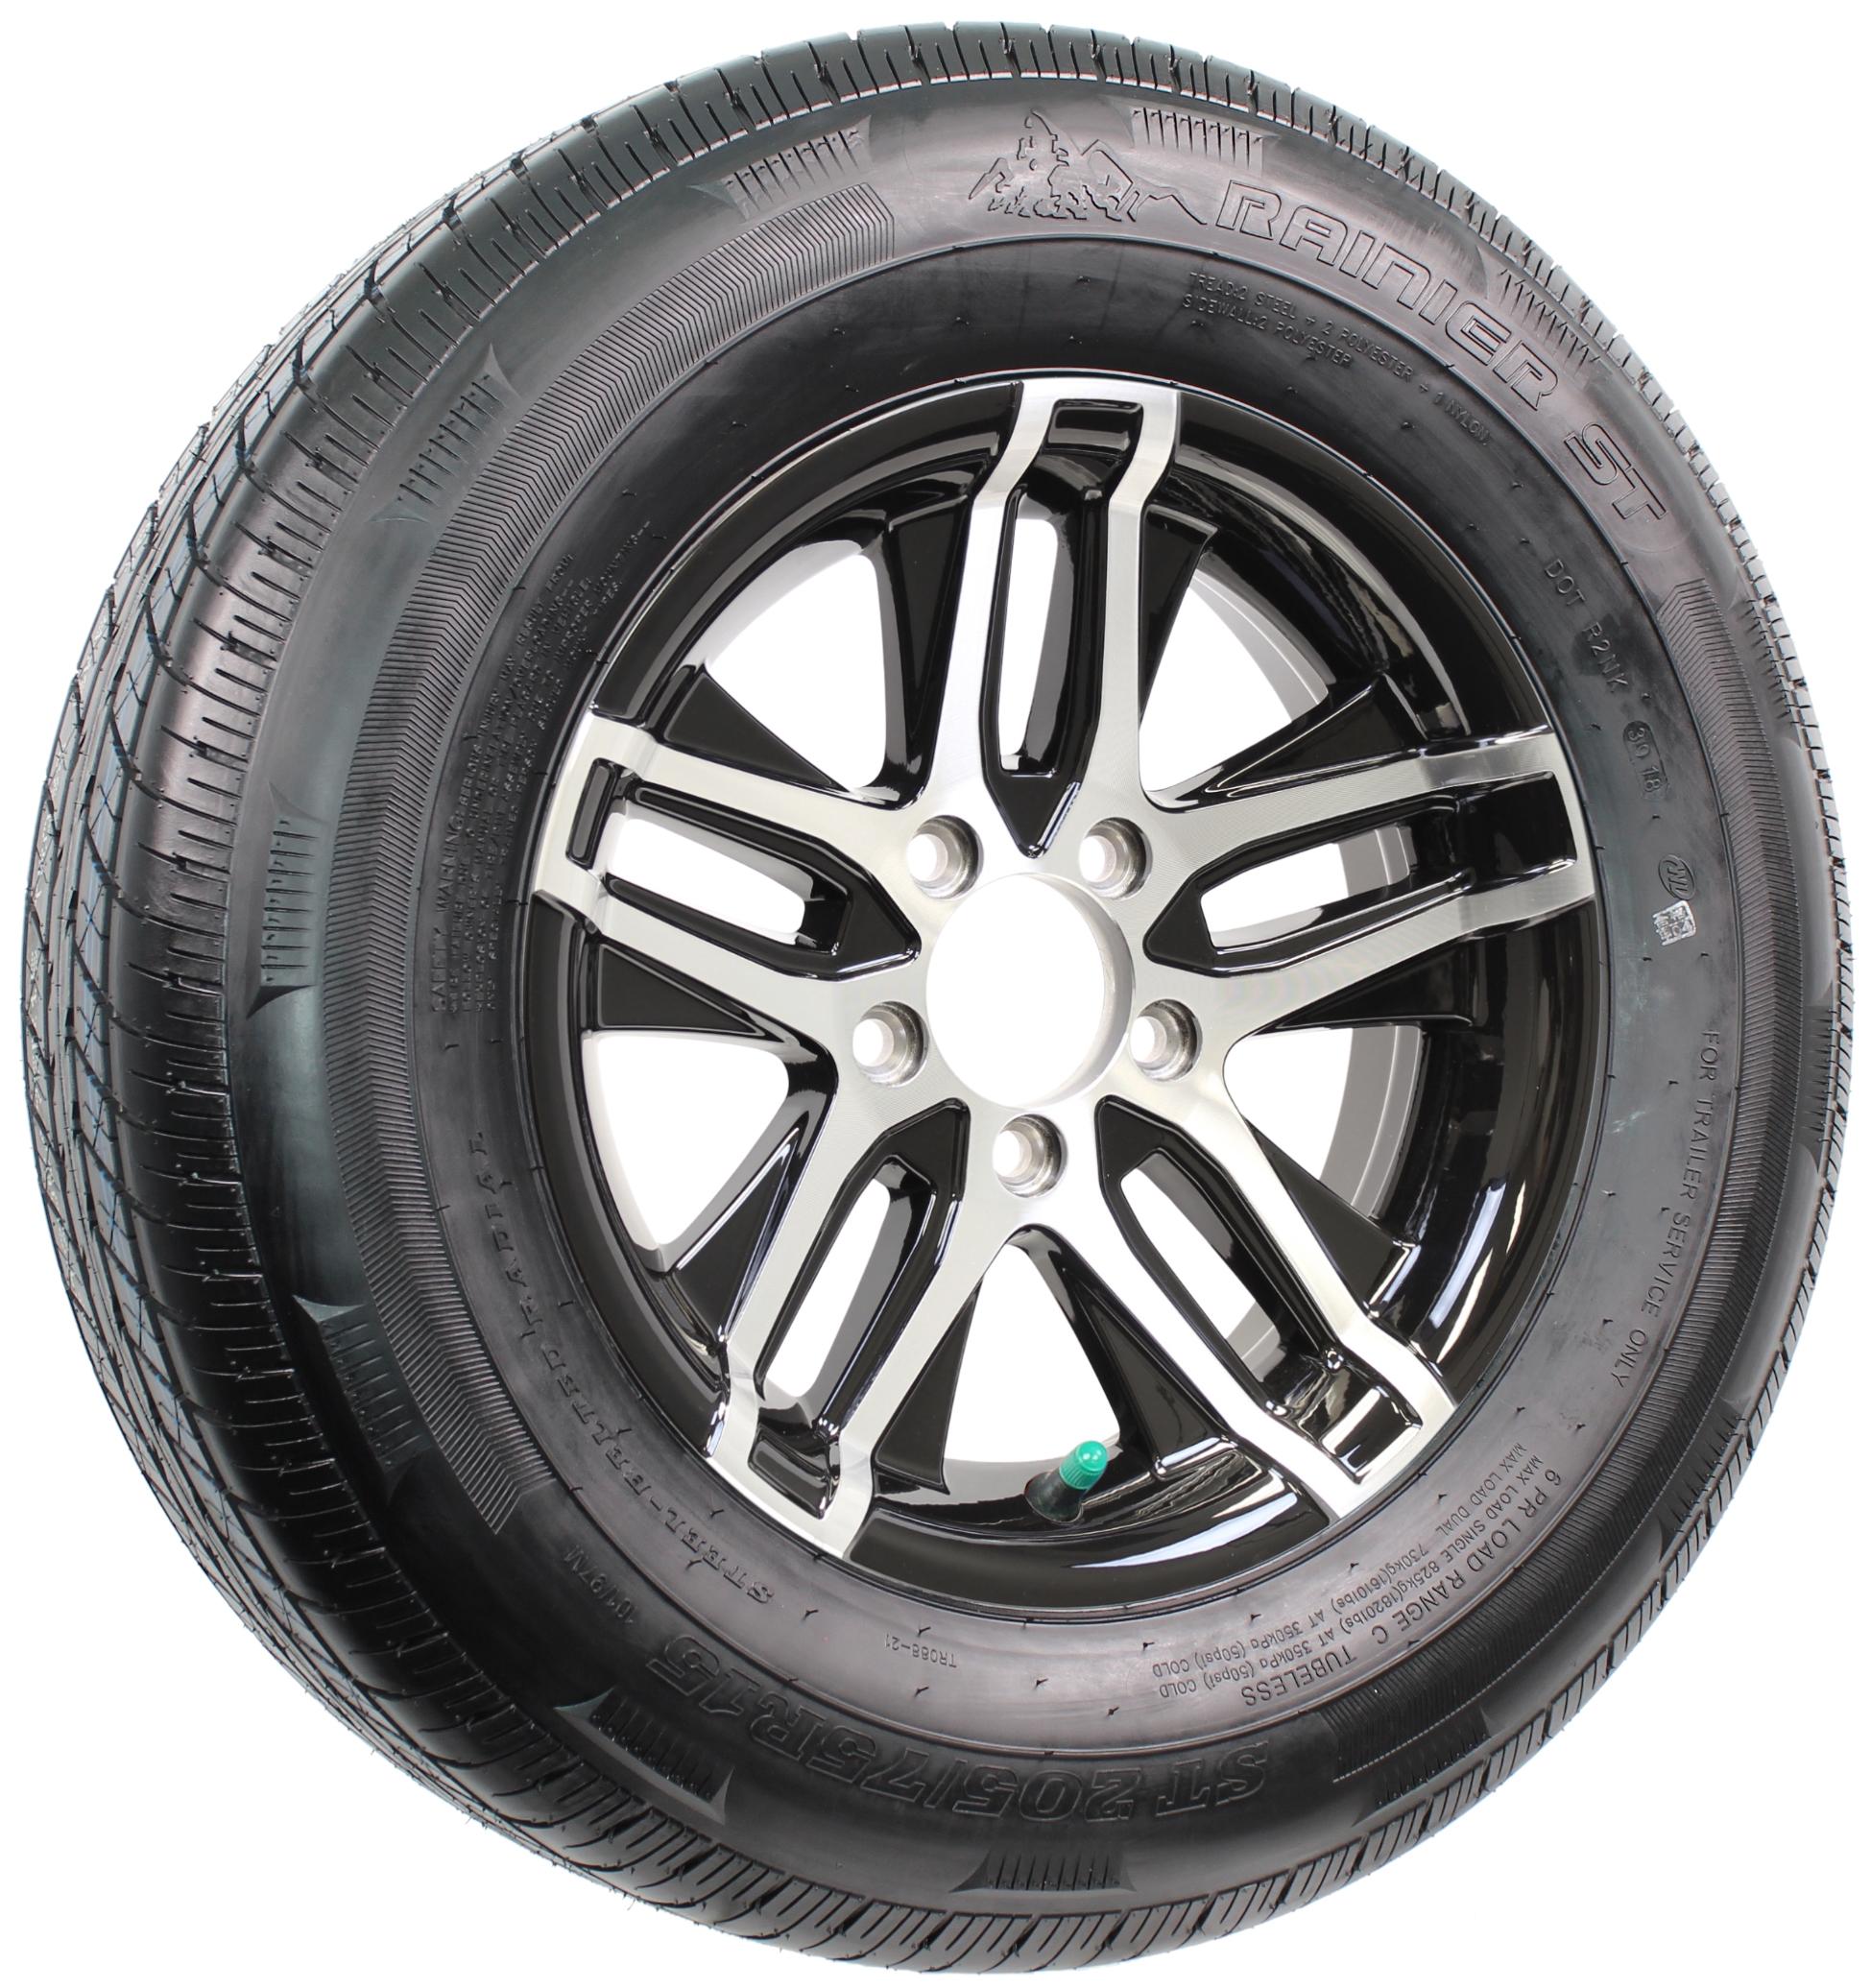 Rainier ST205/75R15 LRD Radial Tire on Altitude 15x5 5-4.5 Black/Machine Aluminum Wheel Image